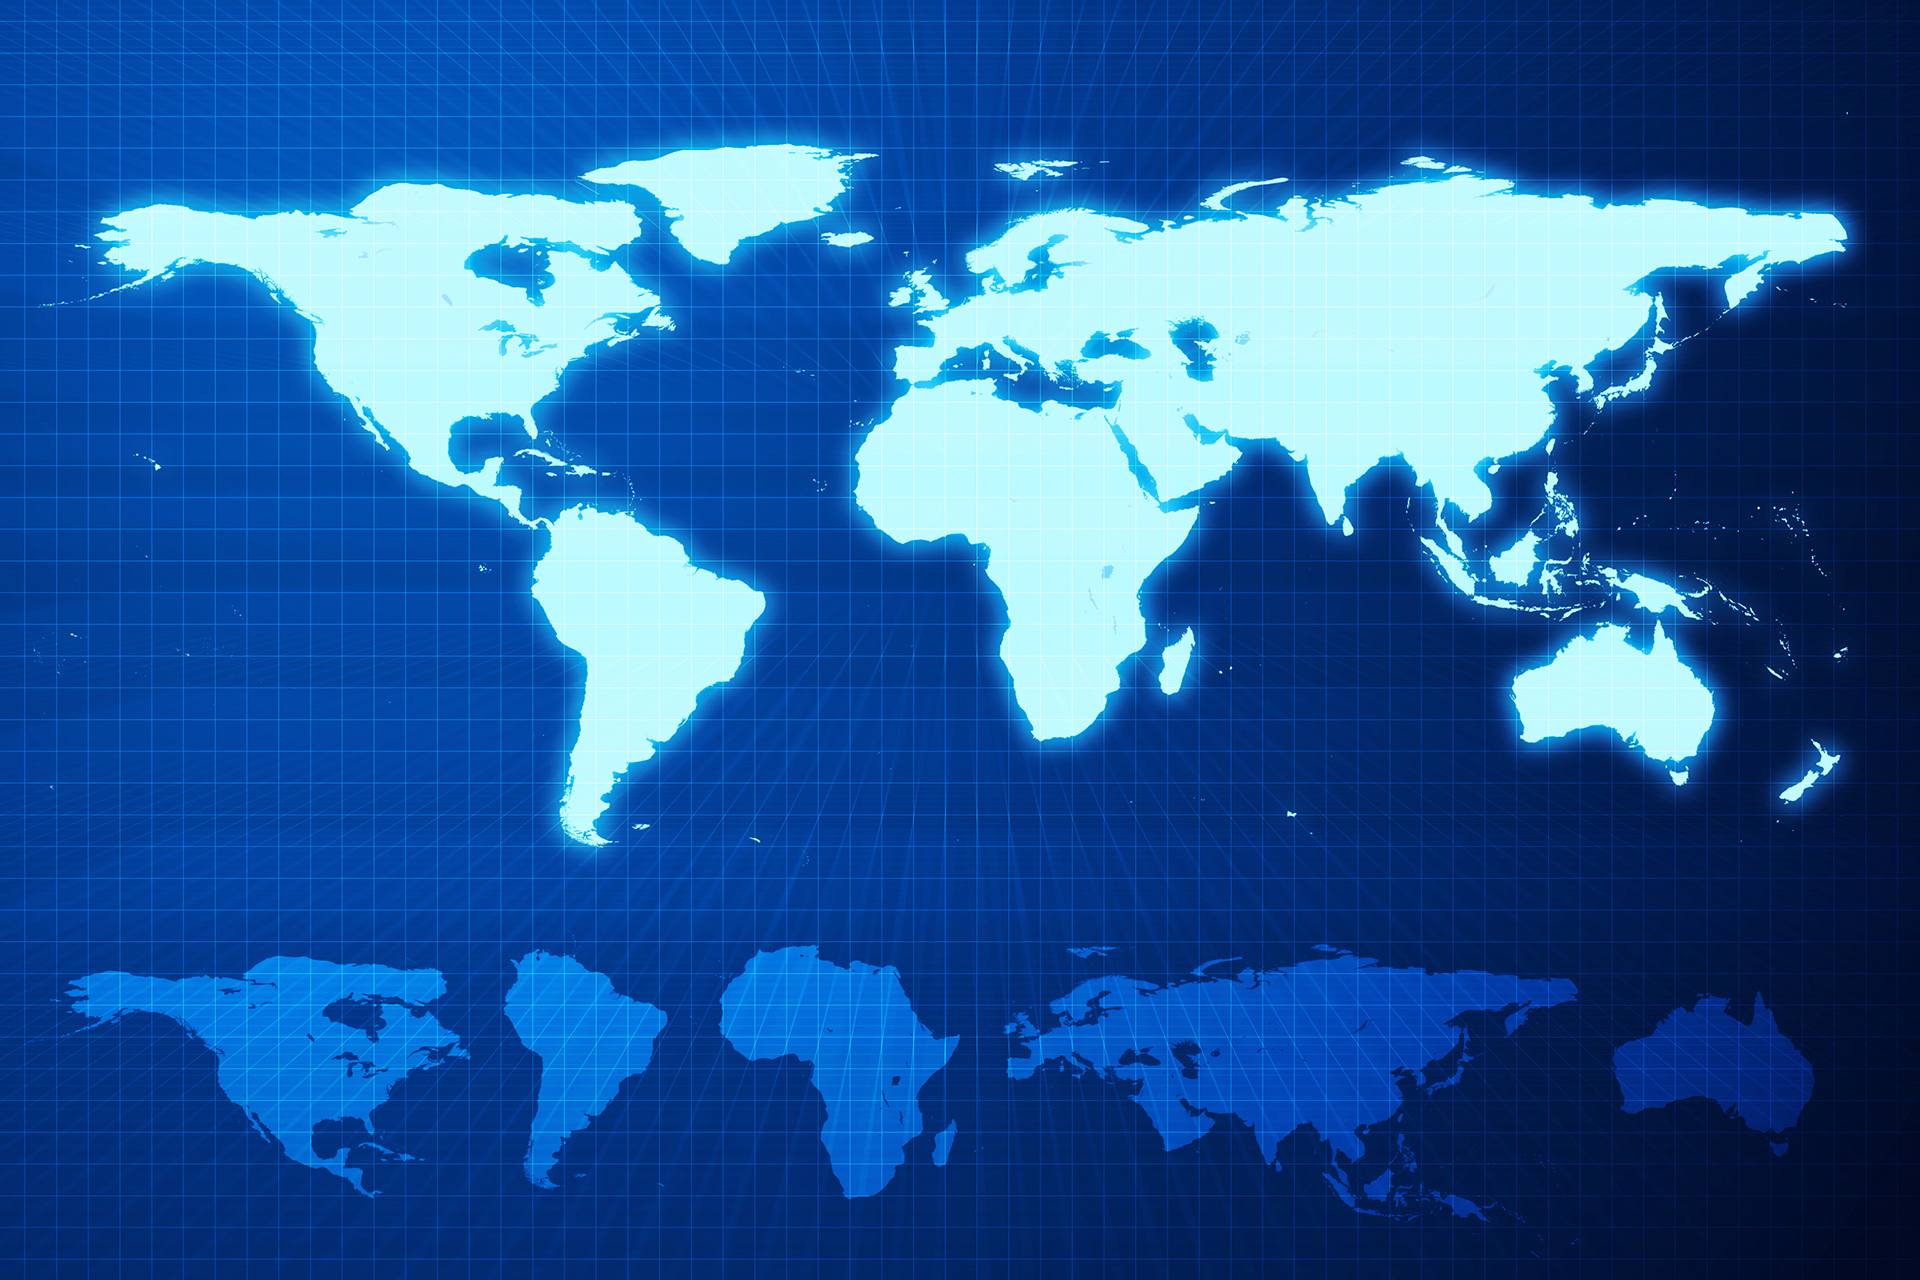 Digital world map by hekee on deviantart digital world map by hekee digital world map by hekee gumiabroncs Images